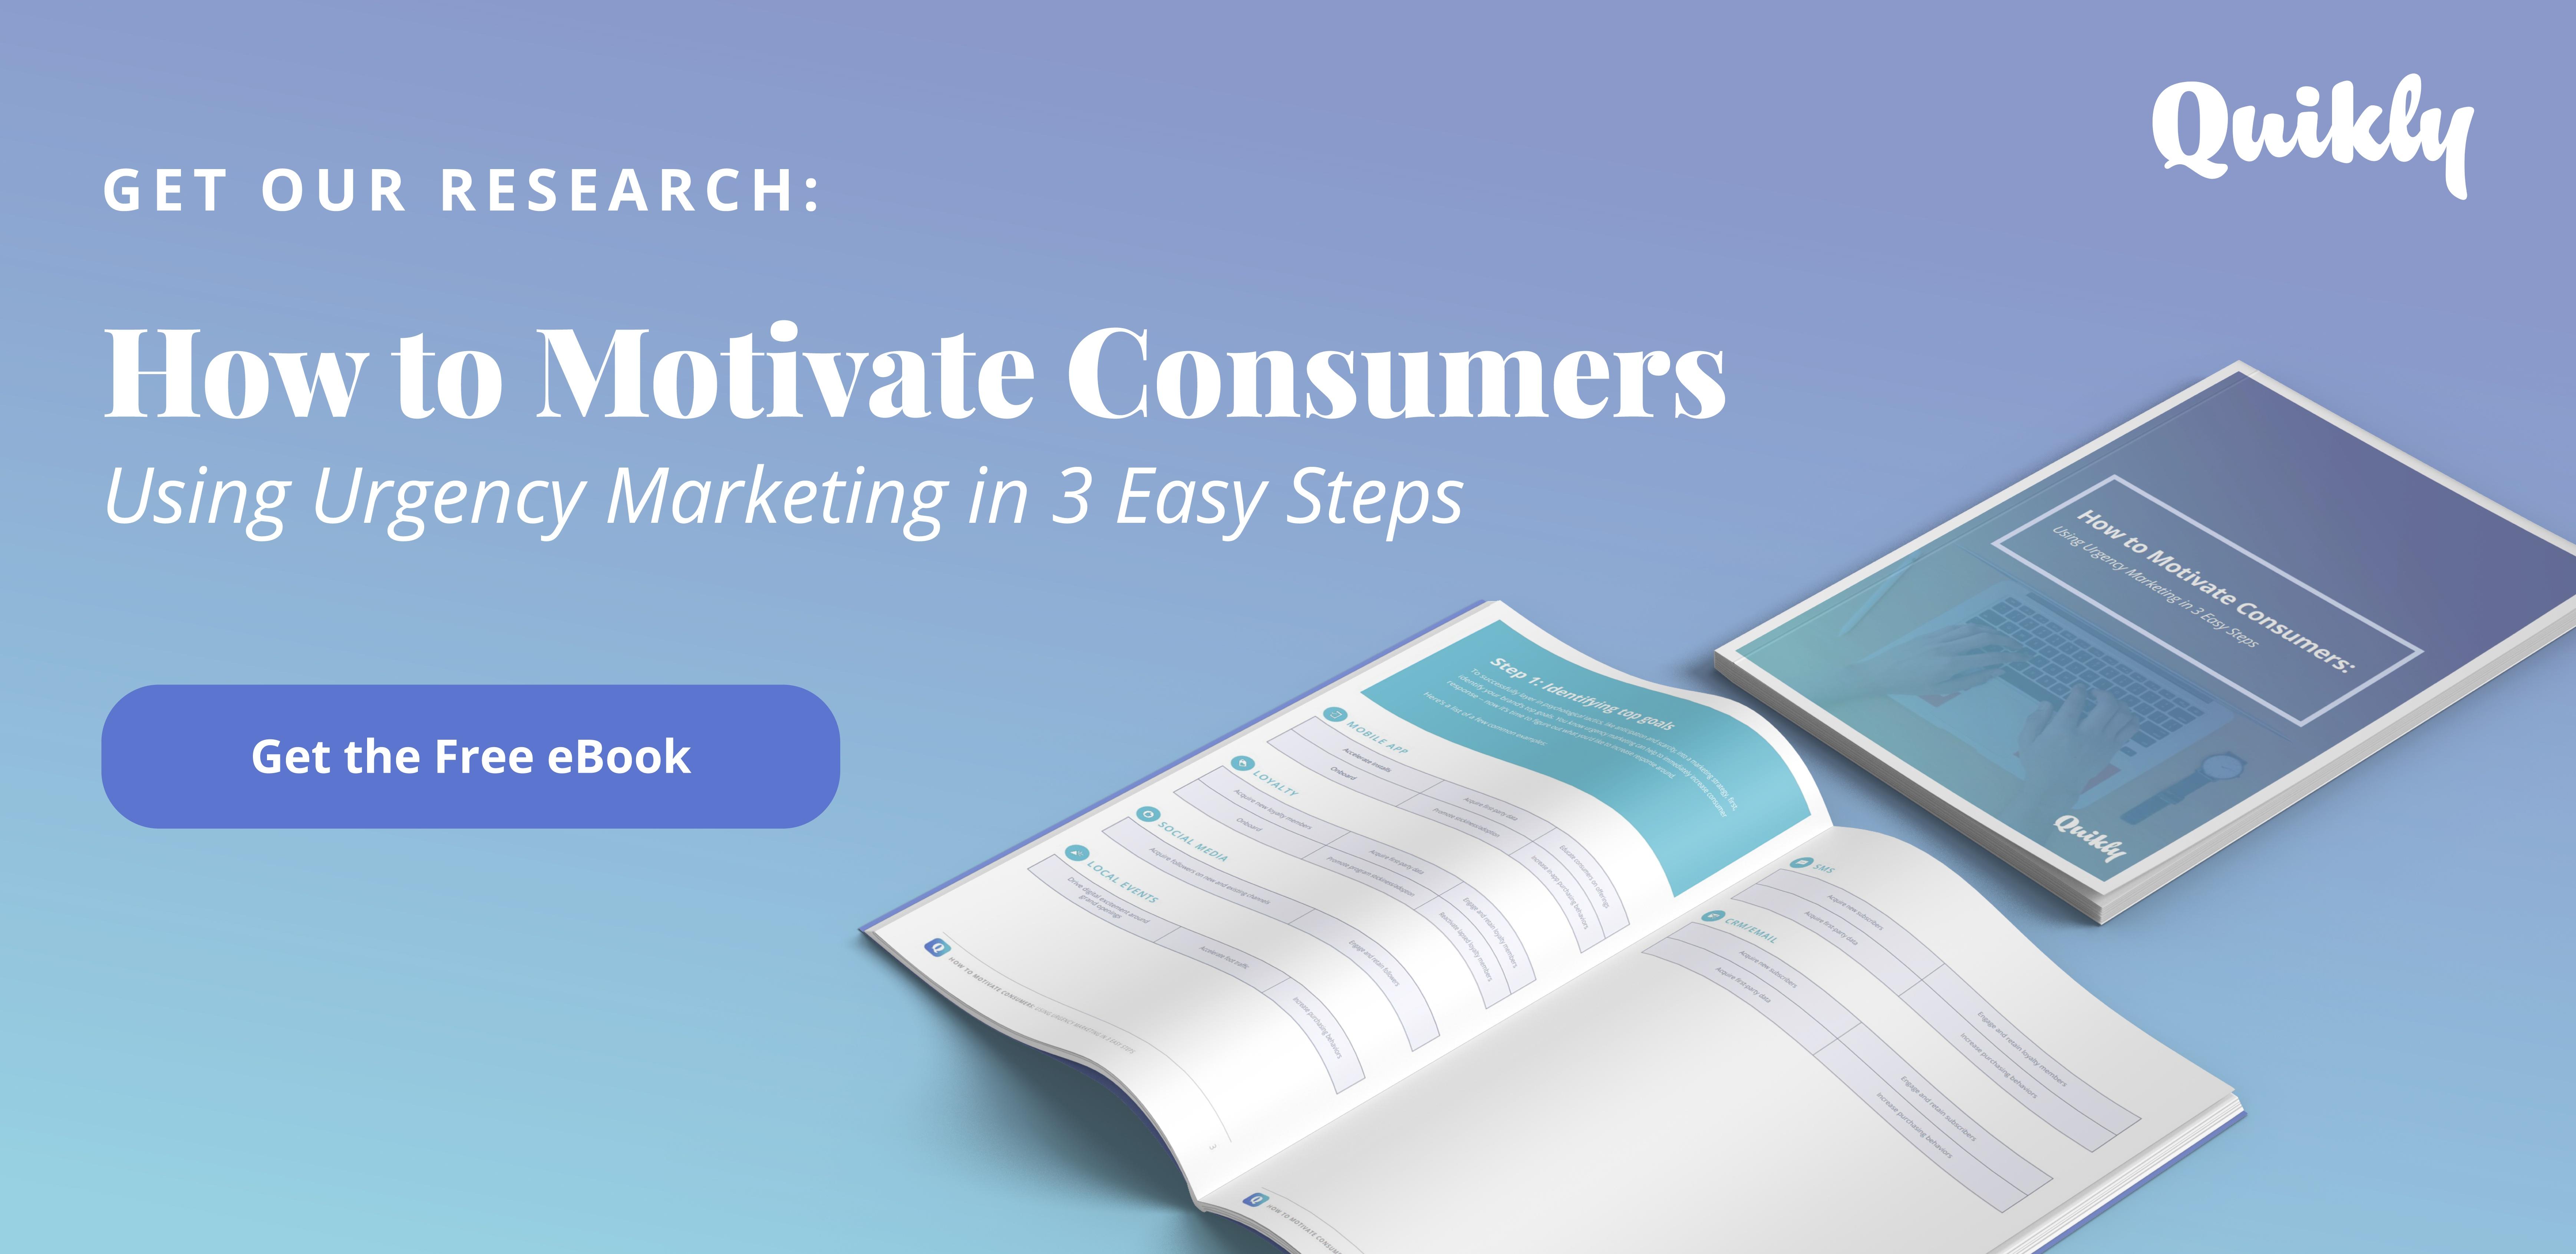 motivate-consumers-urgency-marketing-ebook-cta